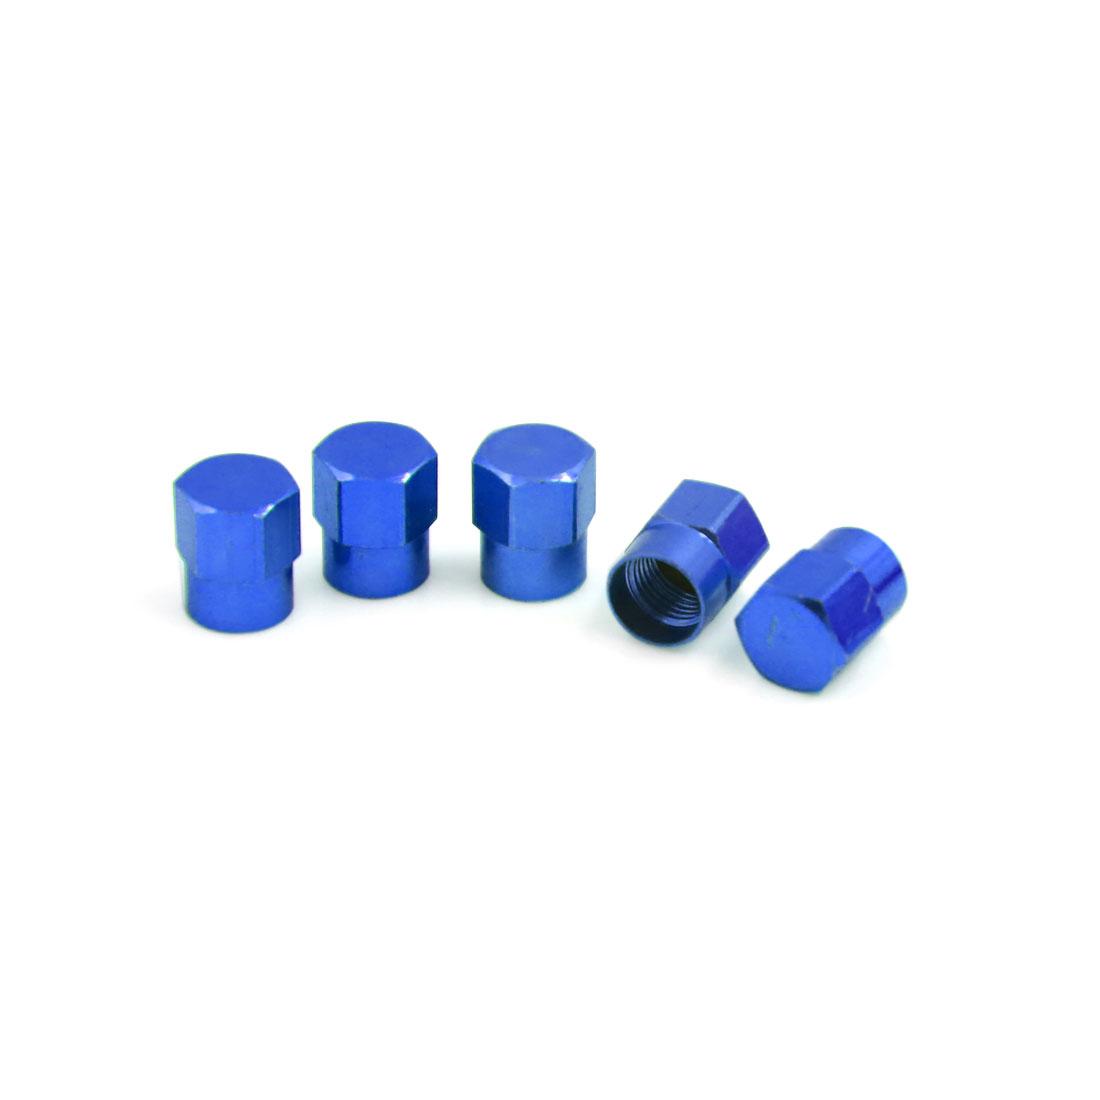 5Pcs Universal Car Motorcycle Wheel Tyre Tire Valve Stem Air Dust Cover Cap Blue